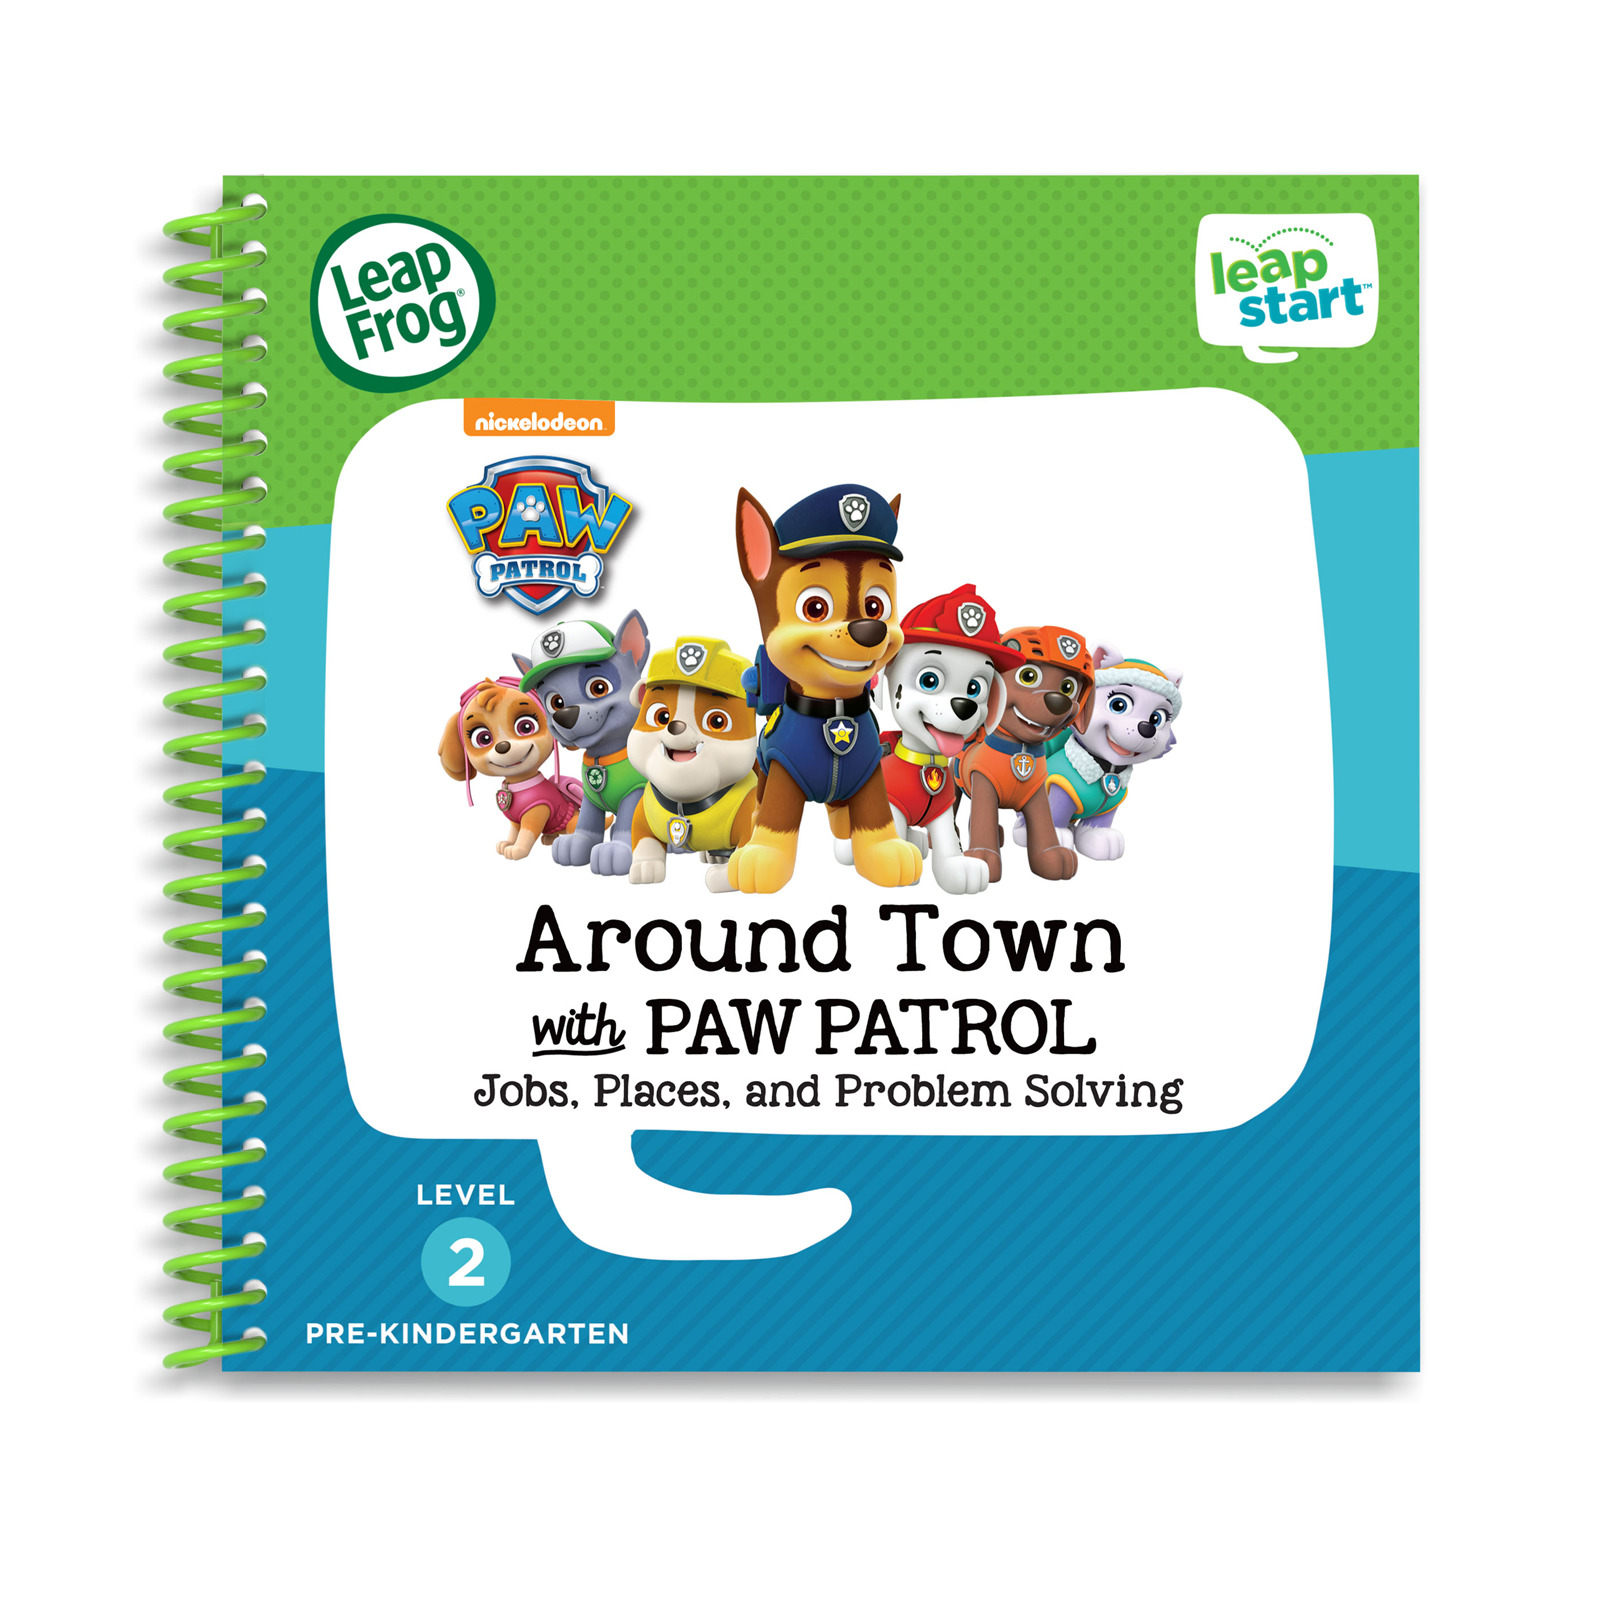 LeapFrog Leapstart Book - Paw Patrol, Around Town With Paw Patrol